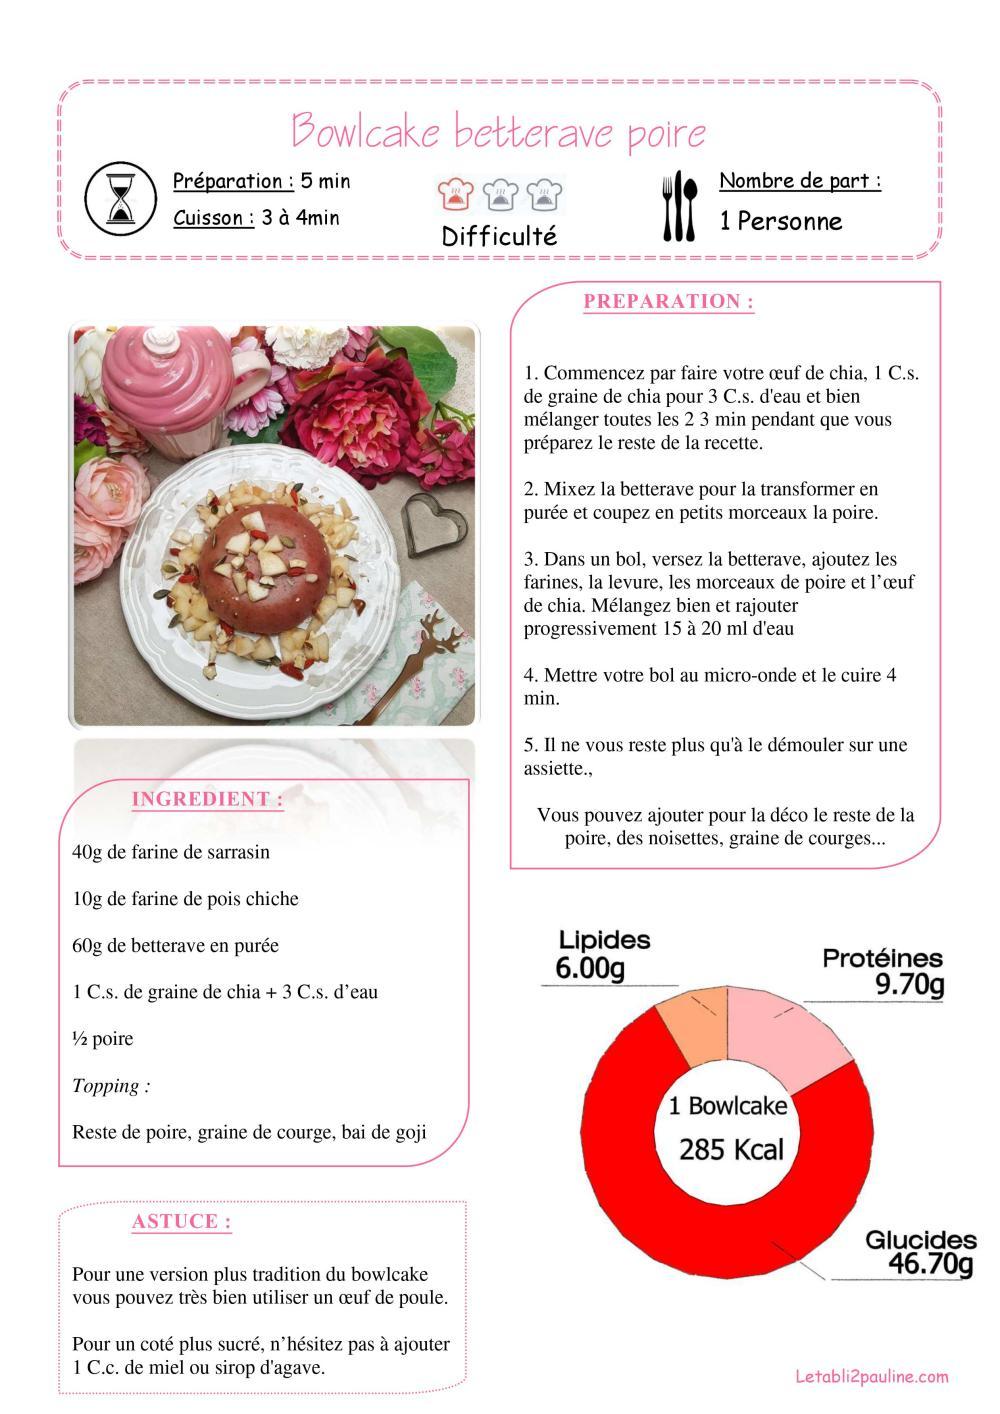 Bowlcake betterave poire